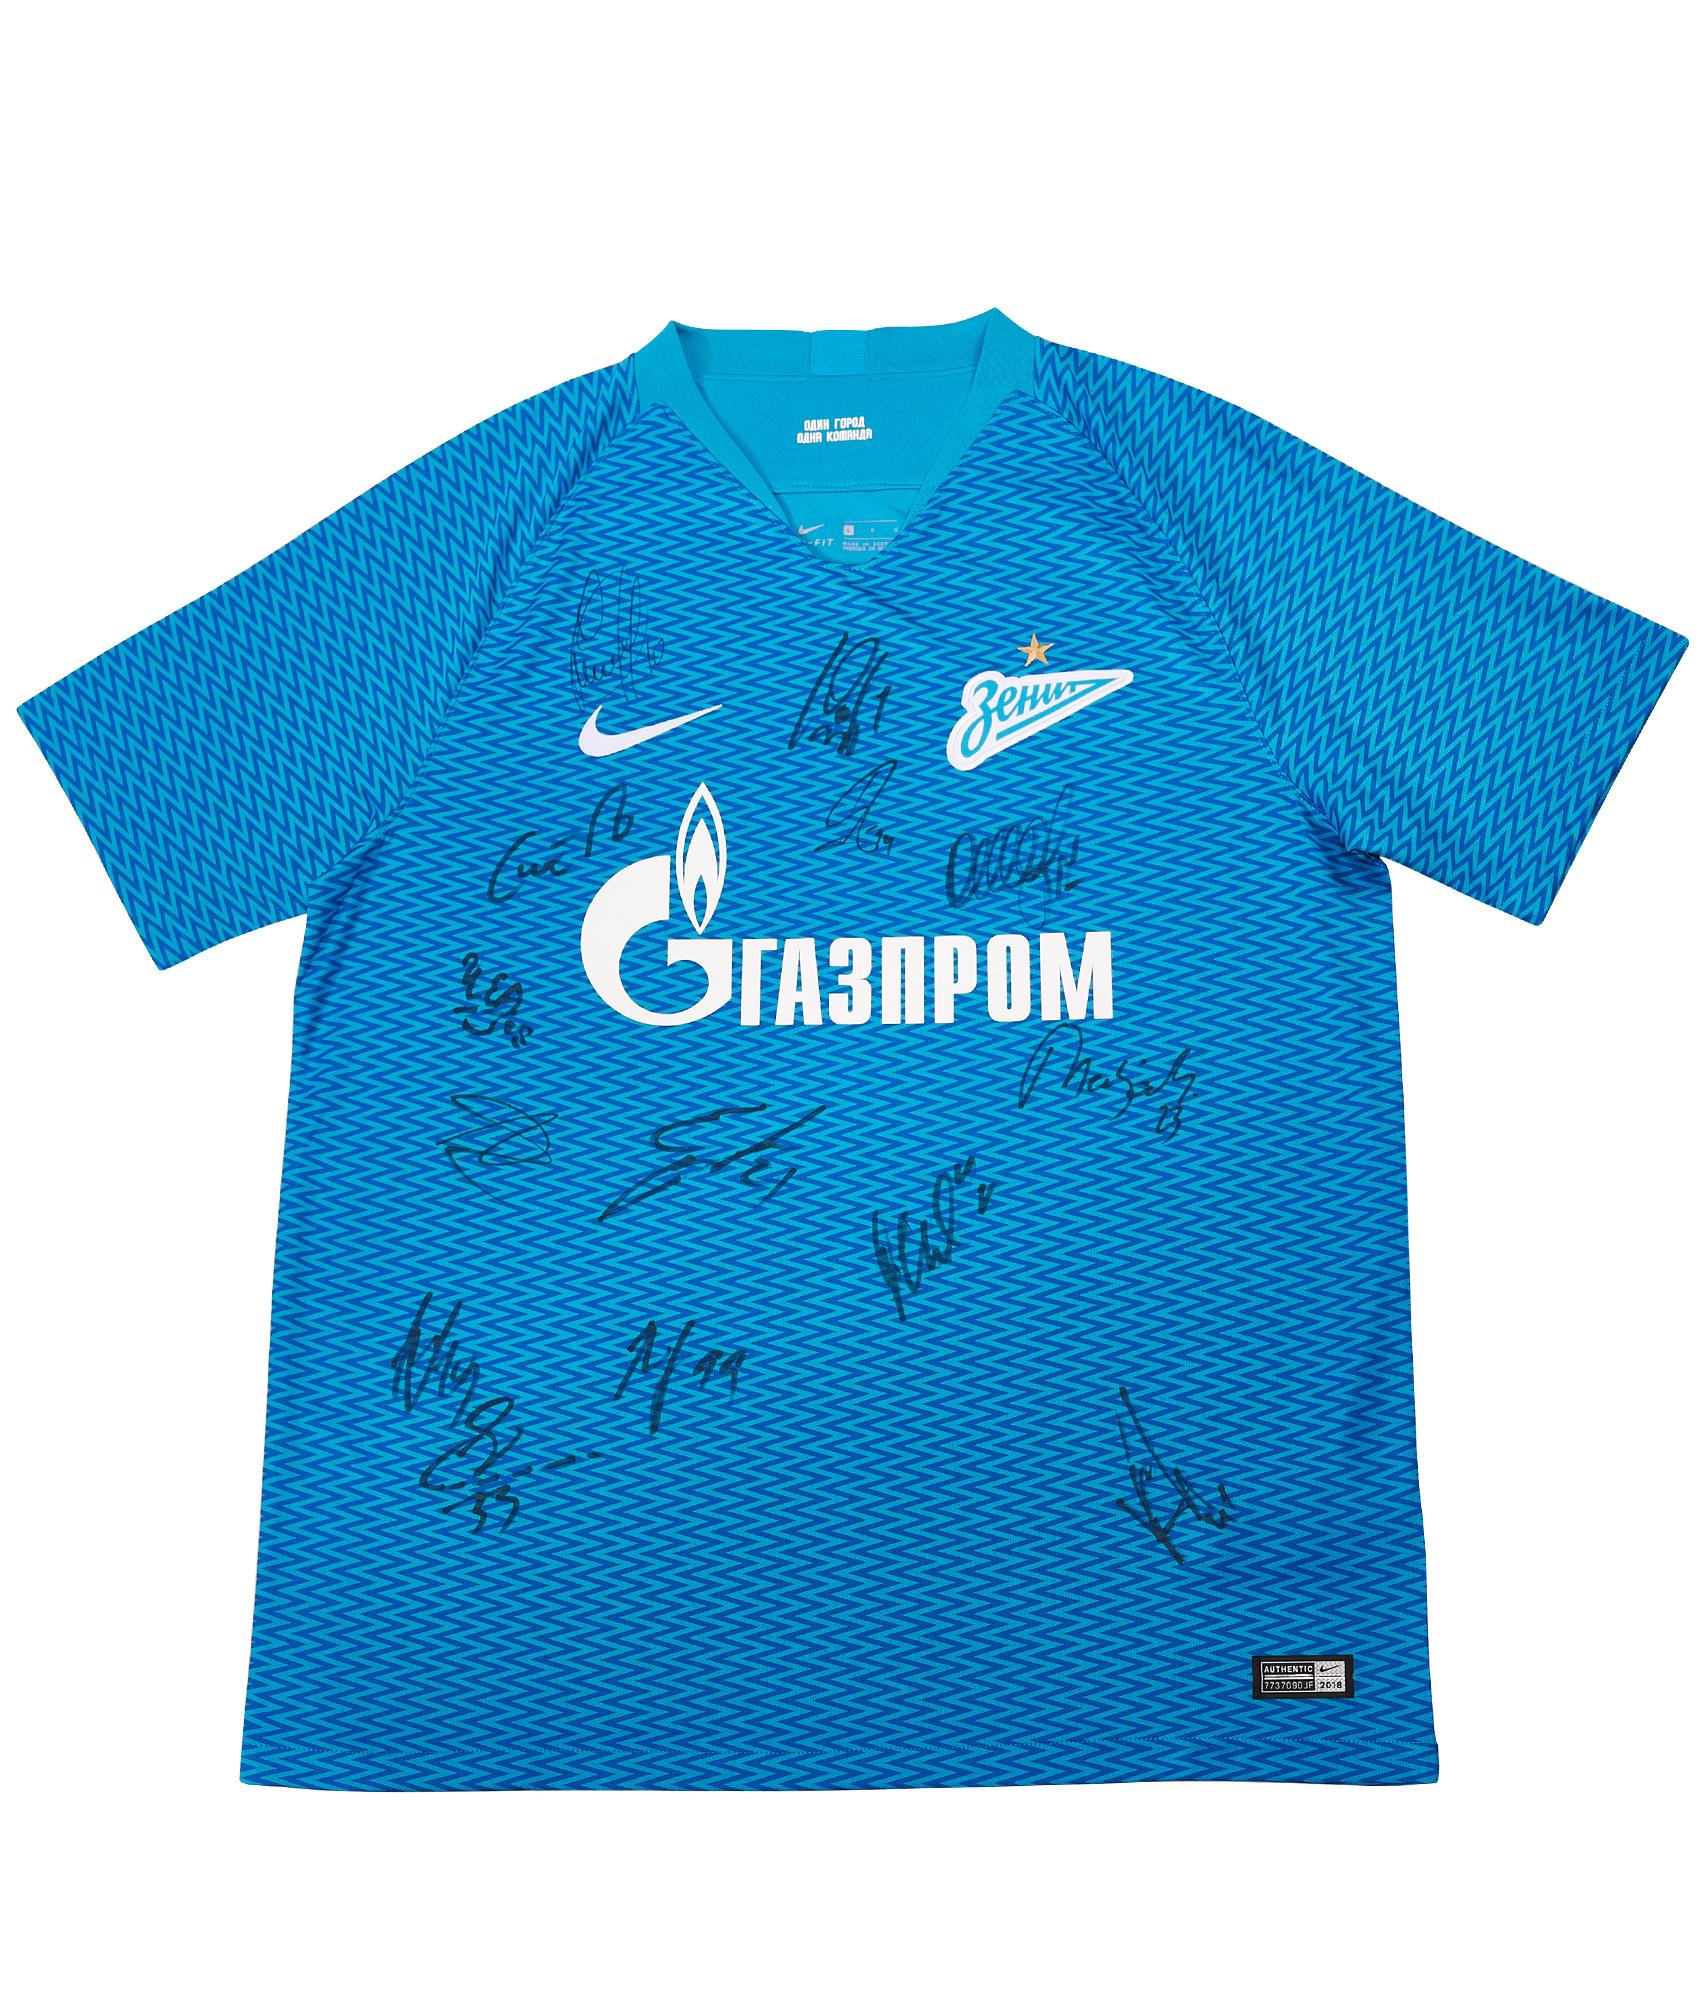 цена Домашняя футболка сезона 2018/19 с автографами Зенит